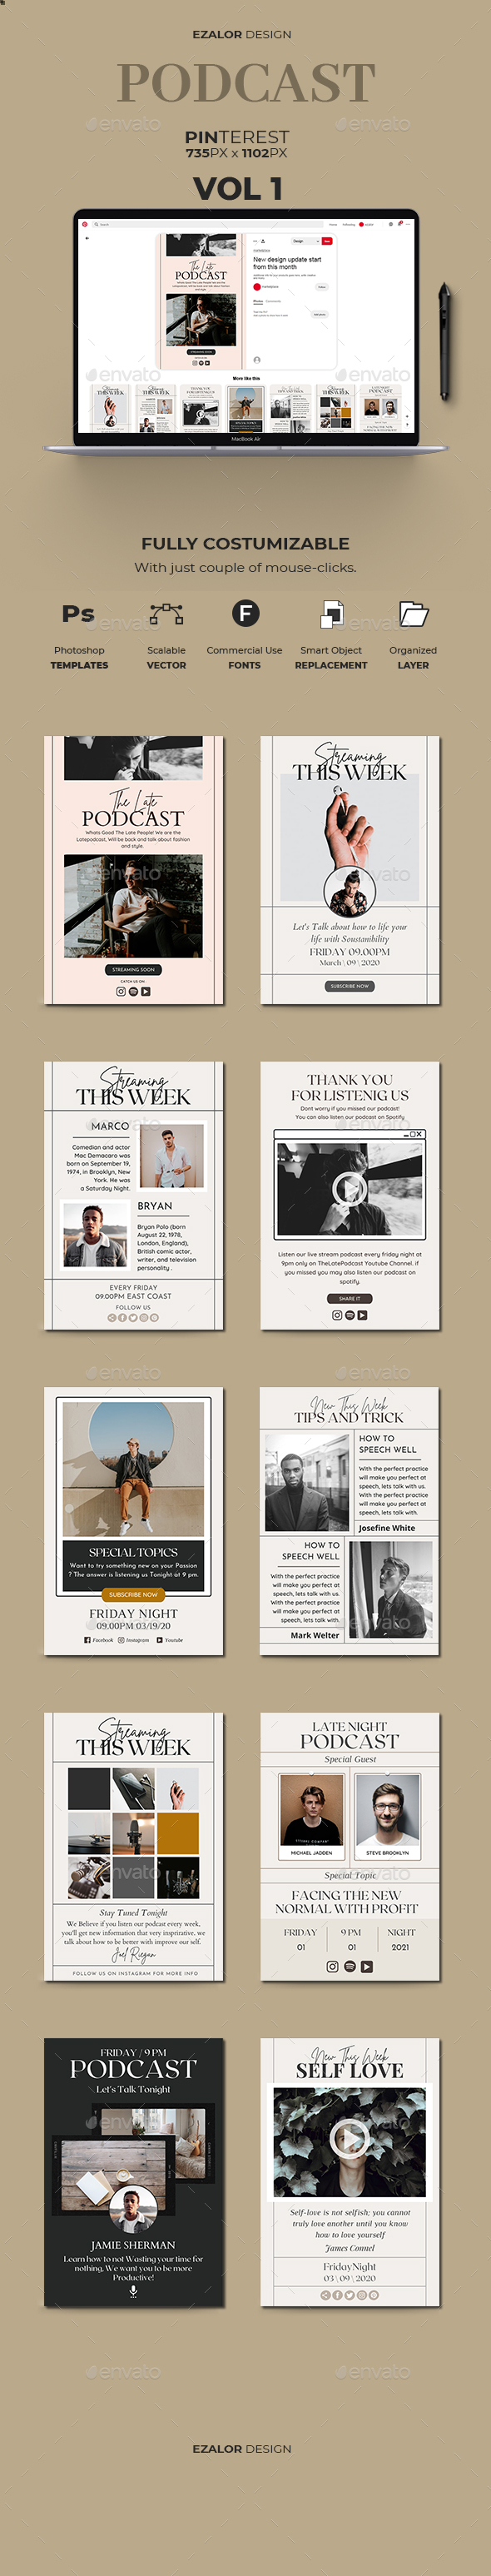 21 Pinterest Fashion Graphics, Designs & Templates